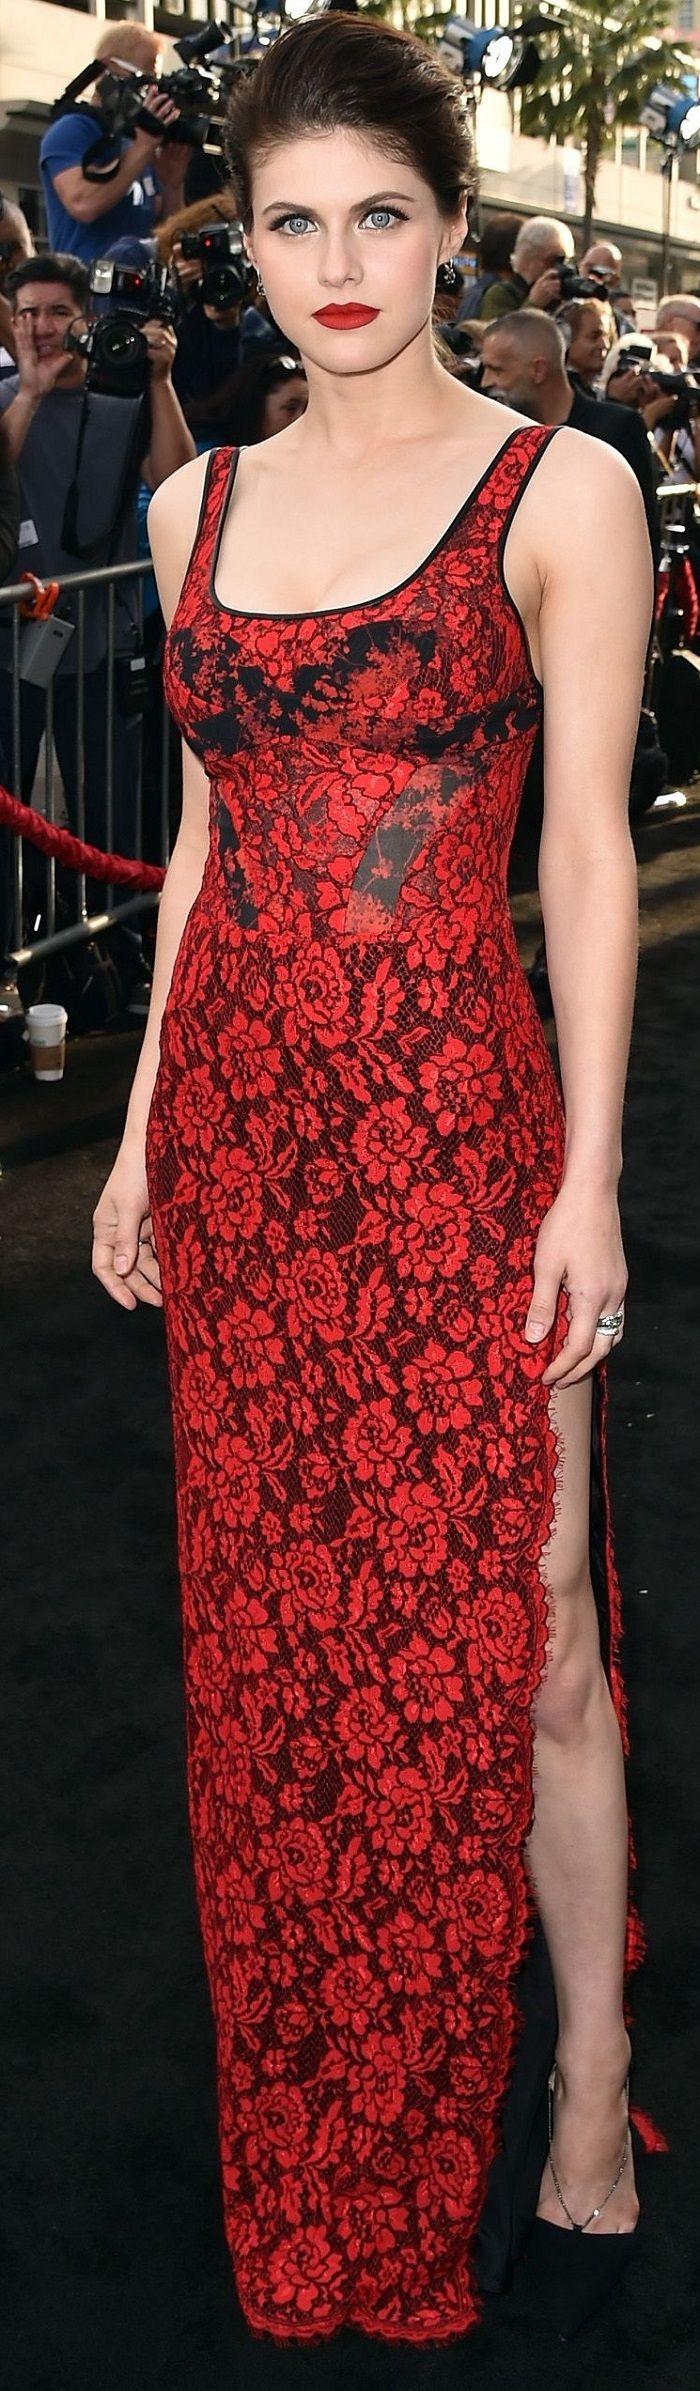 Alexandra Daddario - 'San Andreas' premiere in Hollywood 5-26-2015